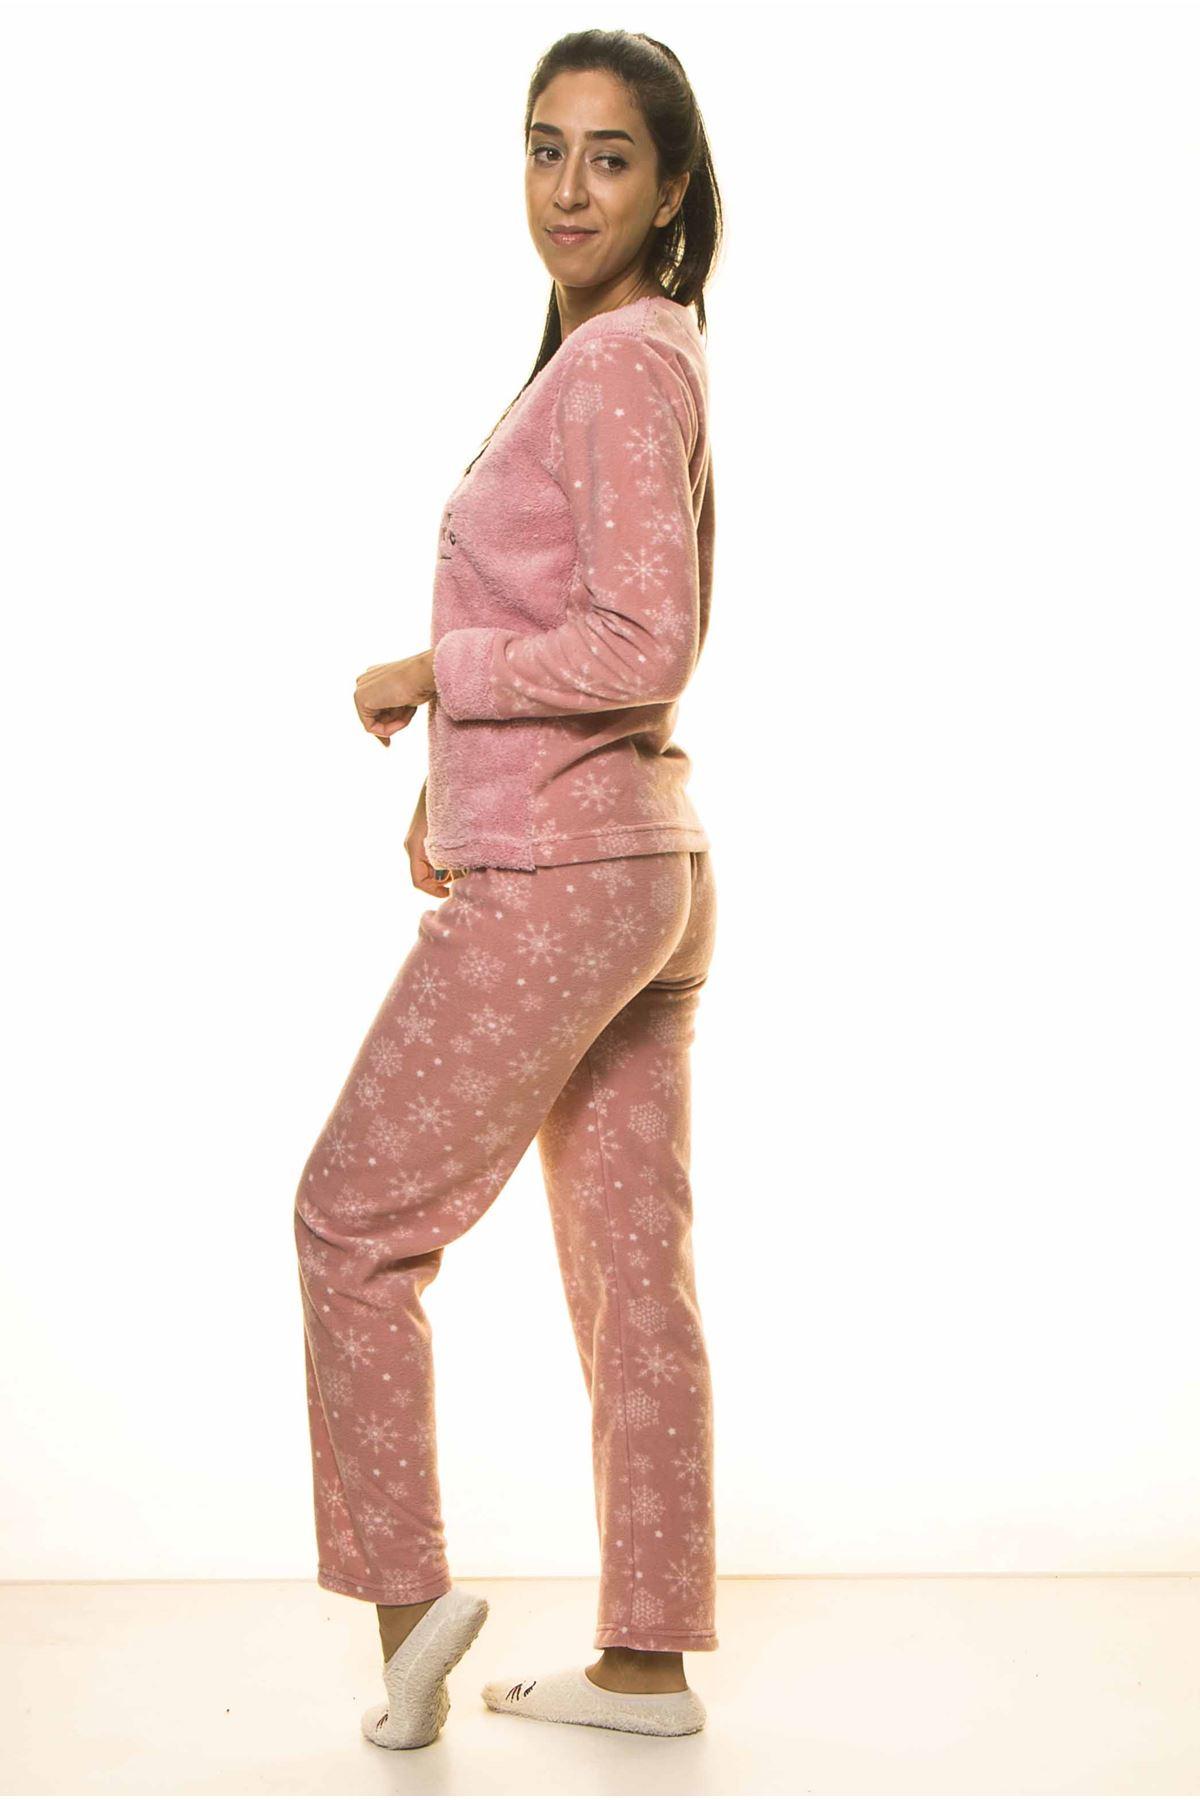 Pembe Kışlık Kar Tanesi Welsoft Peluş Pijama 2C-2046